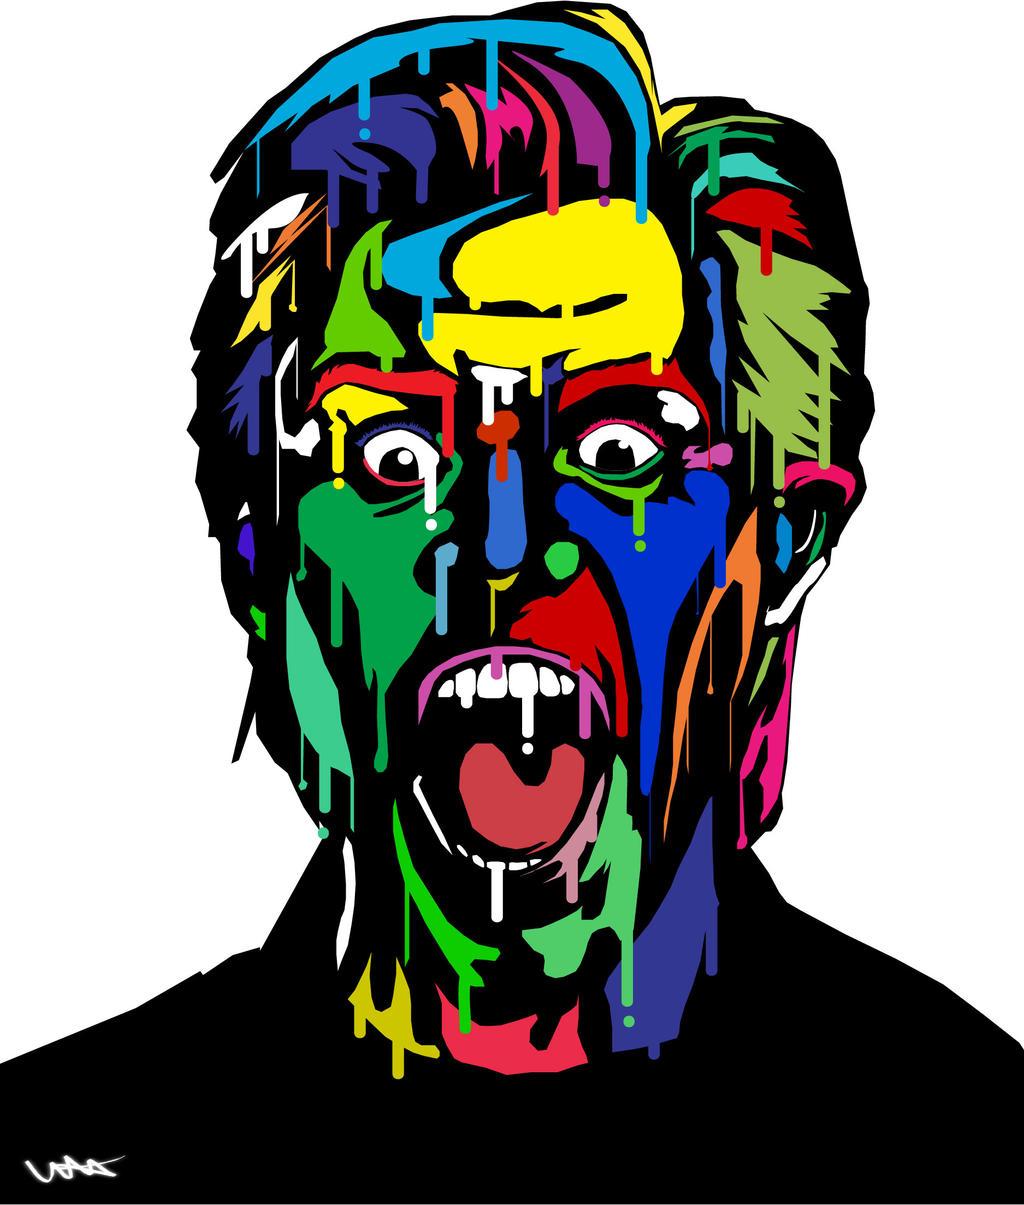 Where To Buy Jim Carrey S Paintings